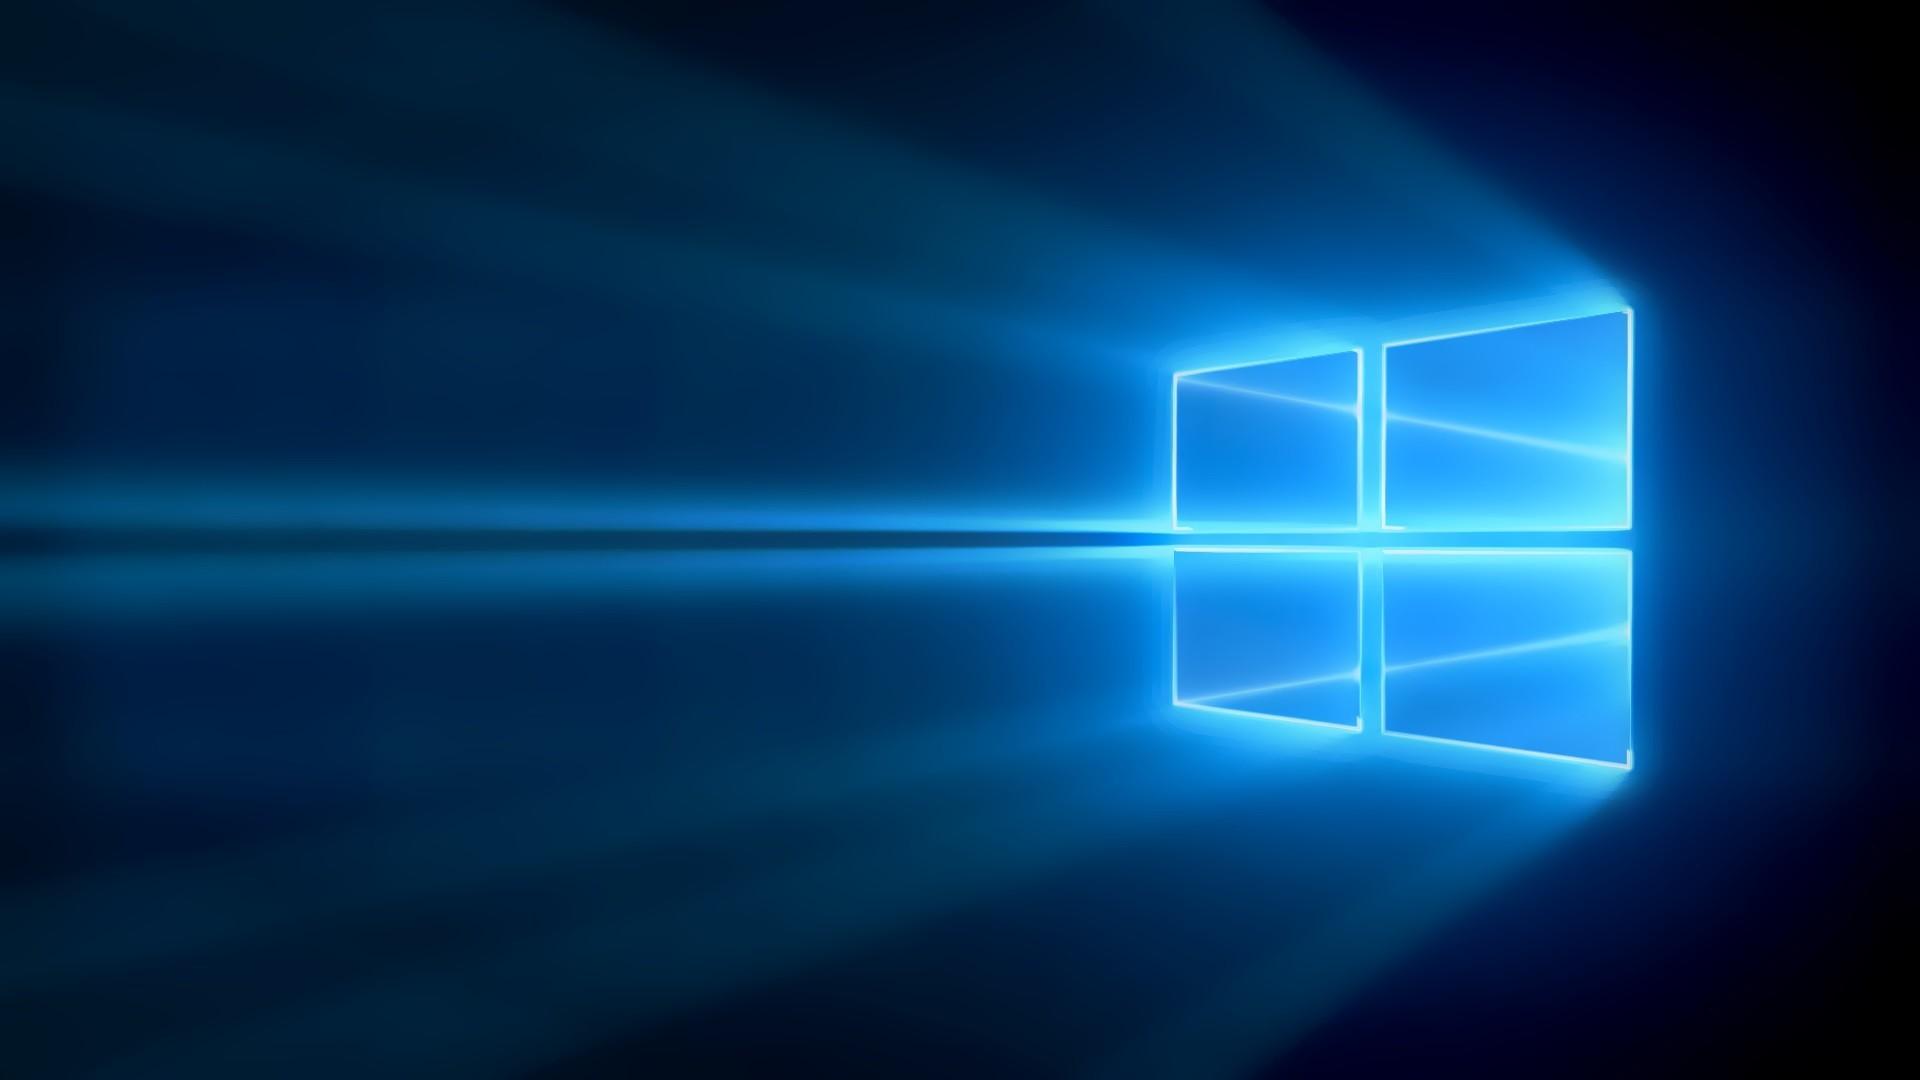 Windows 10 Dual Monitor wallpaper ·① Download free ...